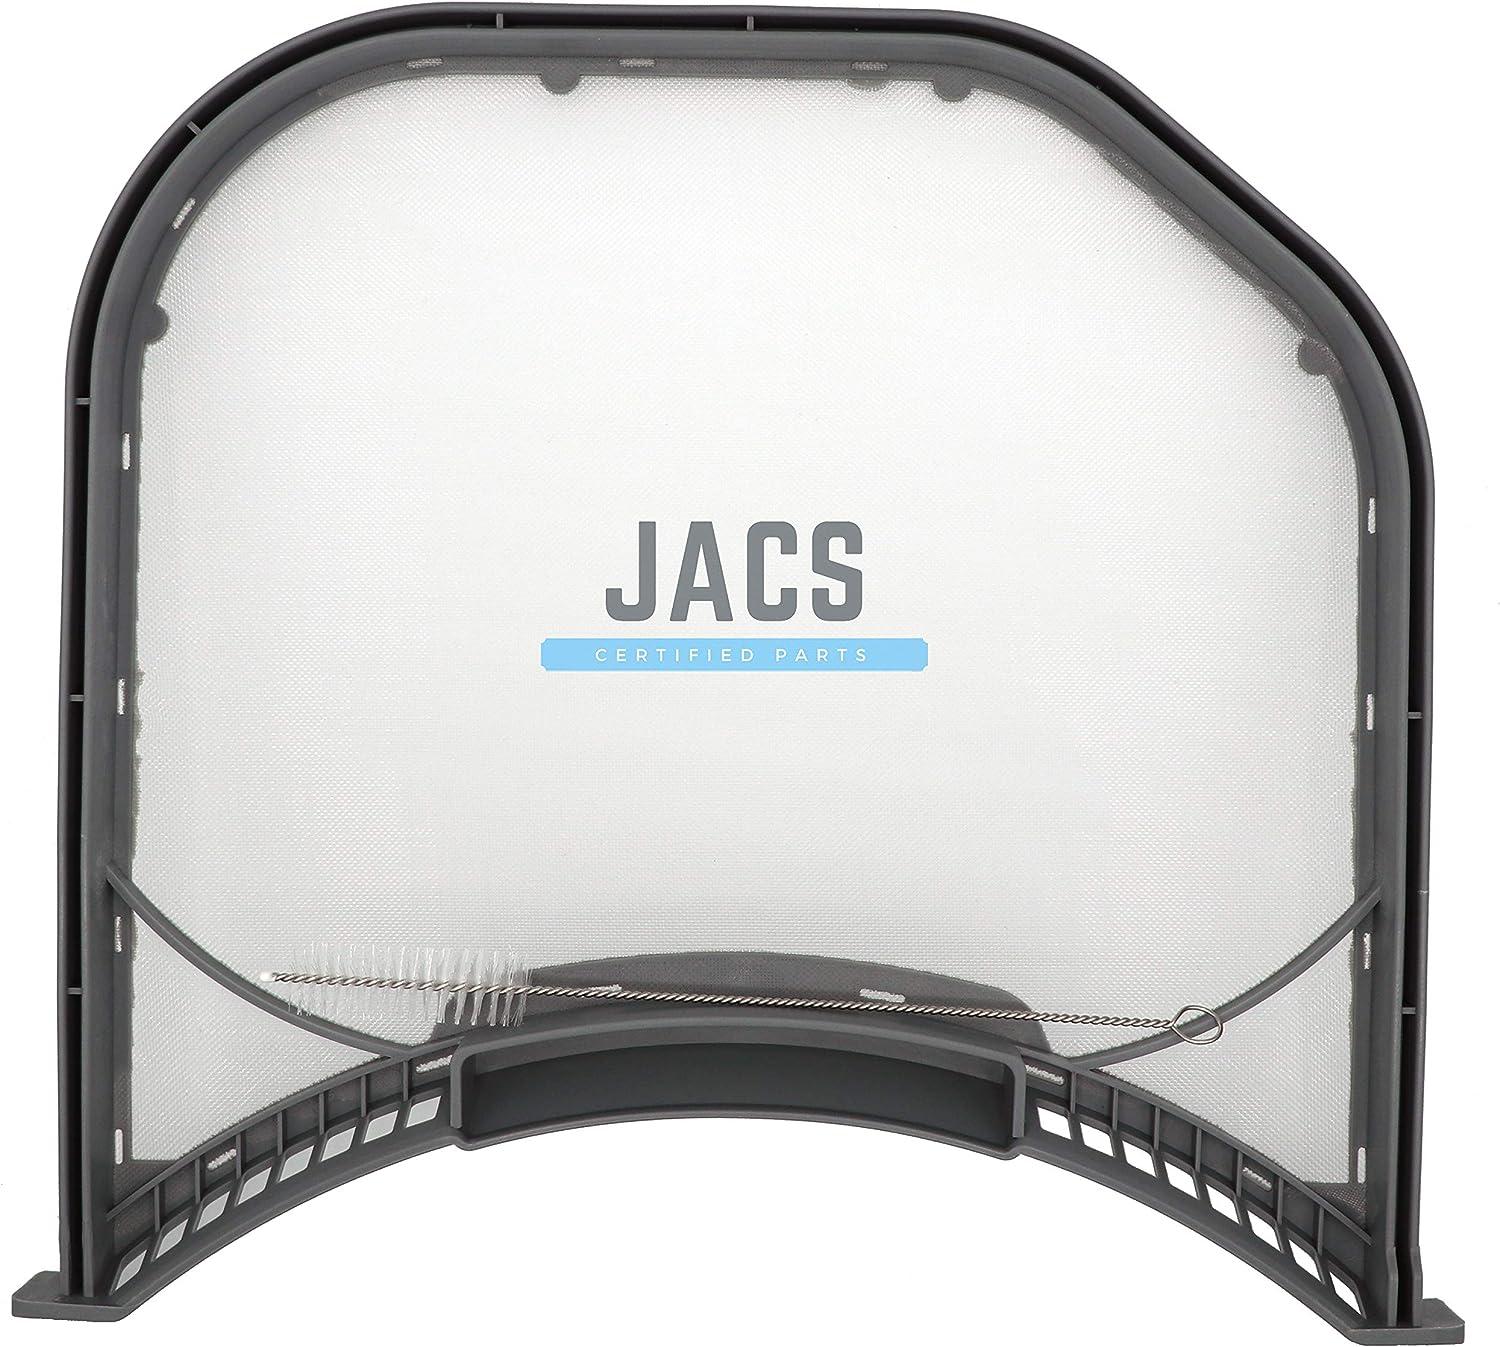 LG Dryer Lint Filter Replacement ADQ56656401- Compatible Kenmore Dryer Lint Filter [Bonus Vent Trap Brush] - Replaces AP4457244, 1462822, AH3531962, EA3531962 & PS3531962, JACS